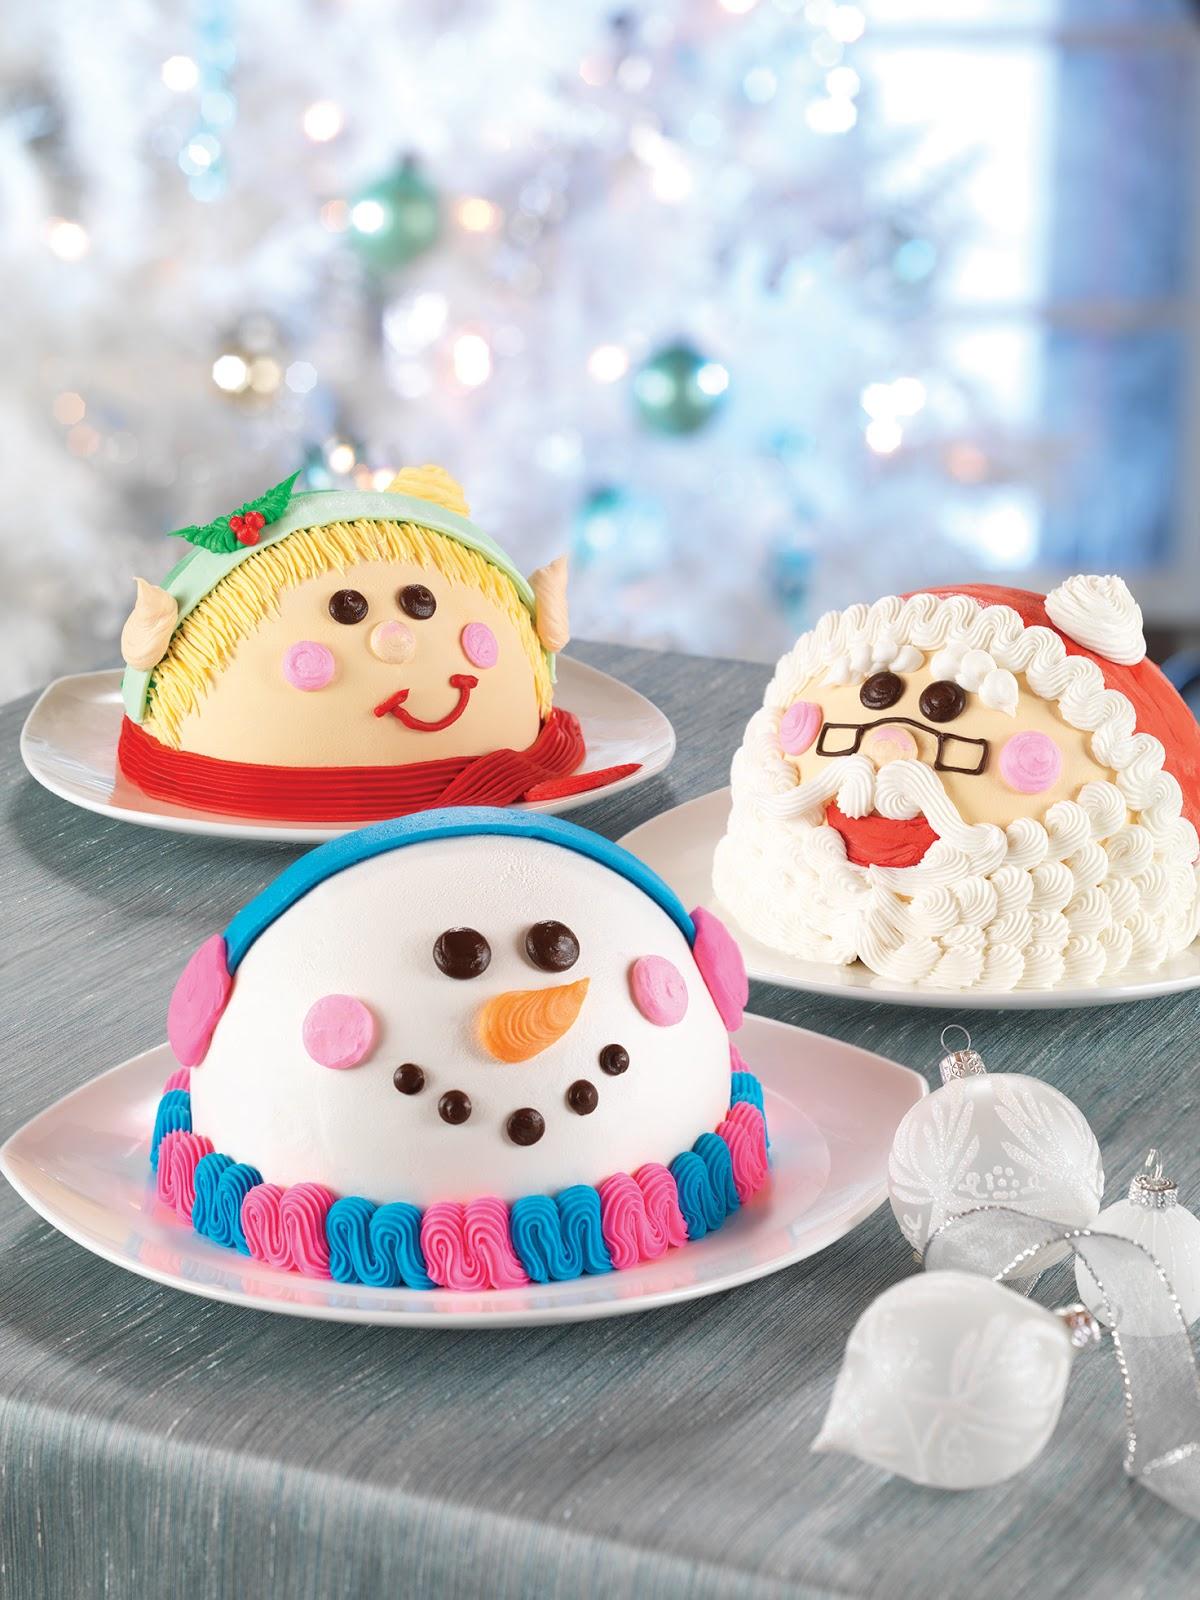 Christmas Icecream Cake Ideas